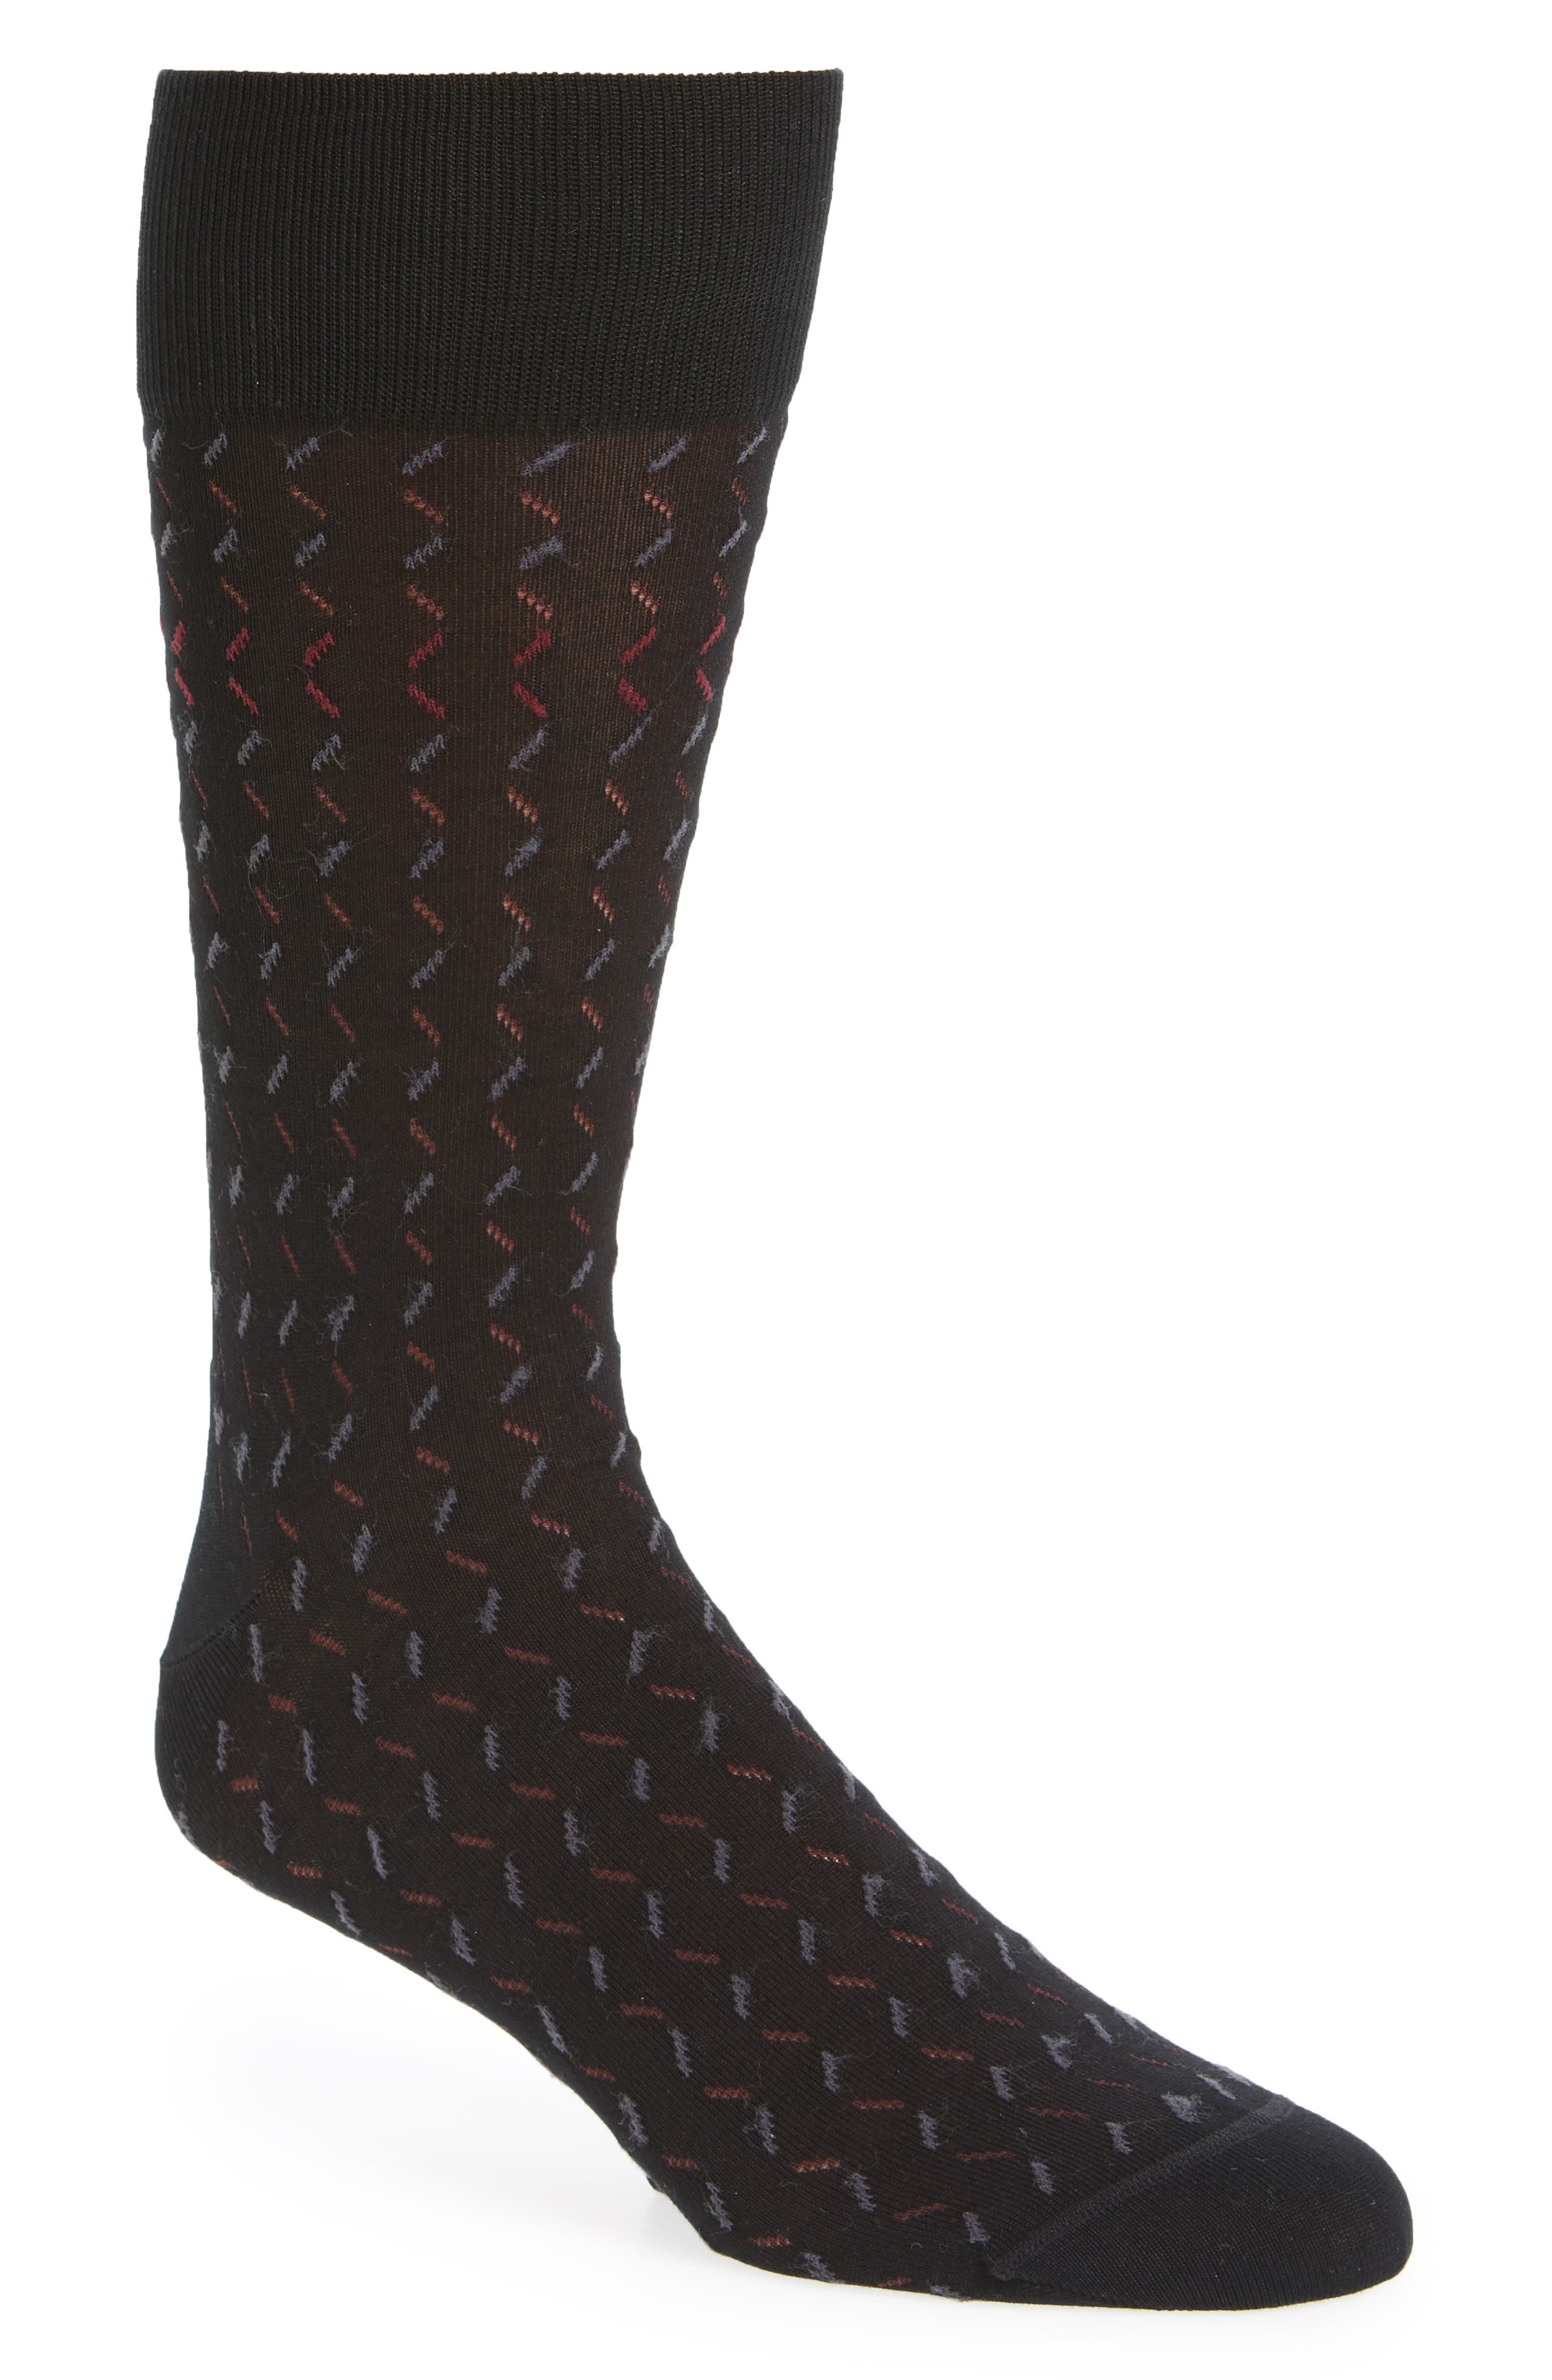 Dash Socks,                         Main,                         color, 001